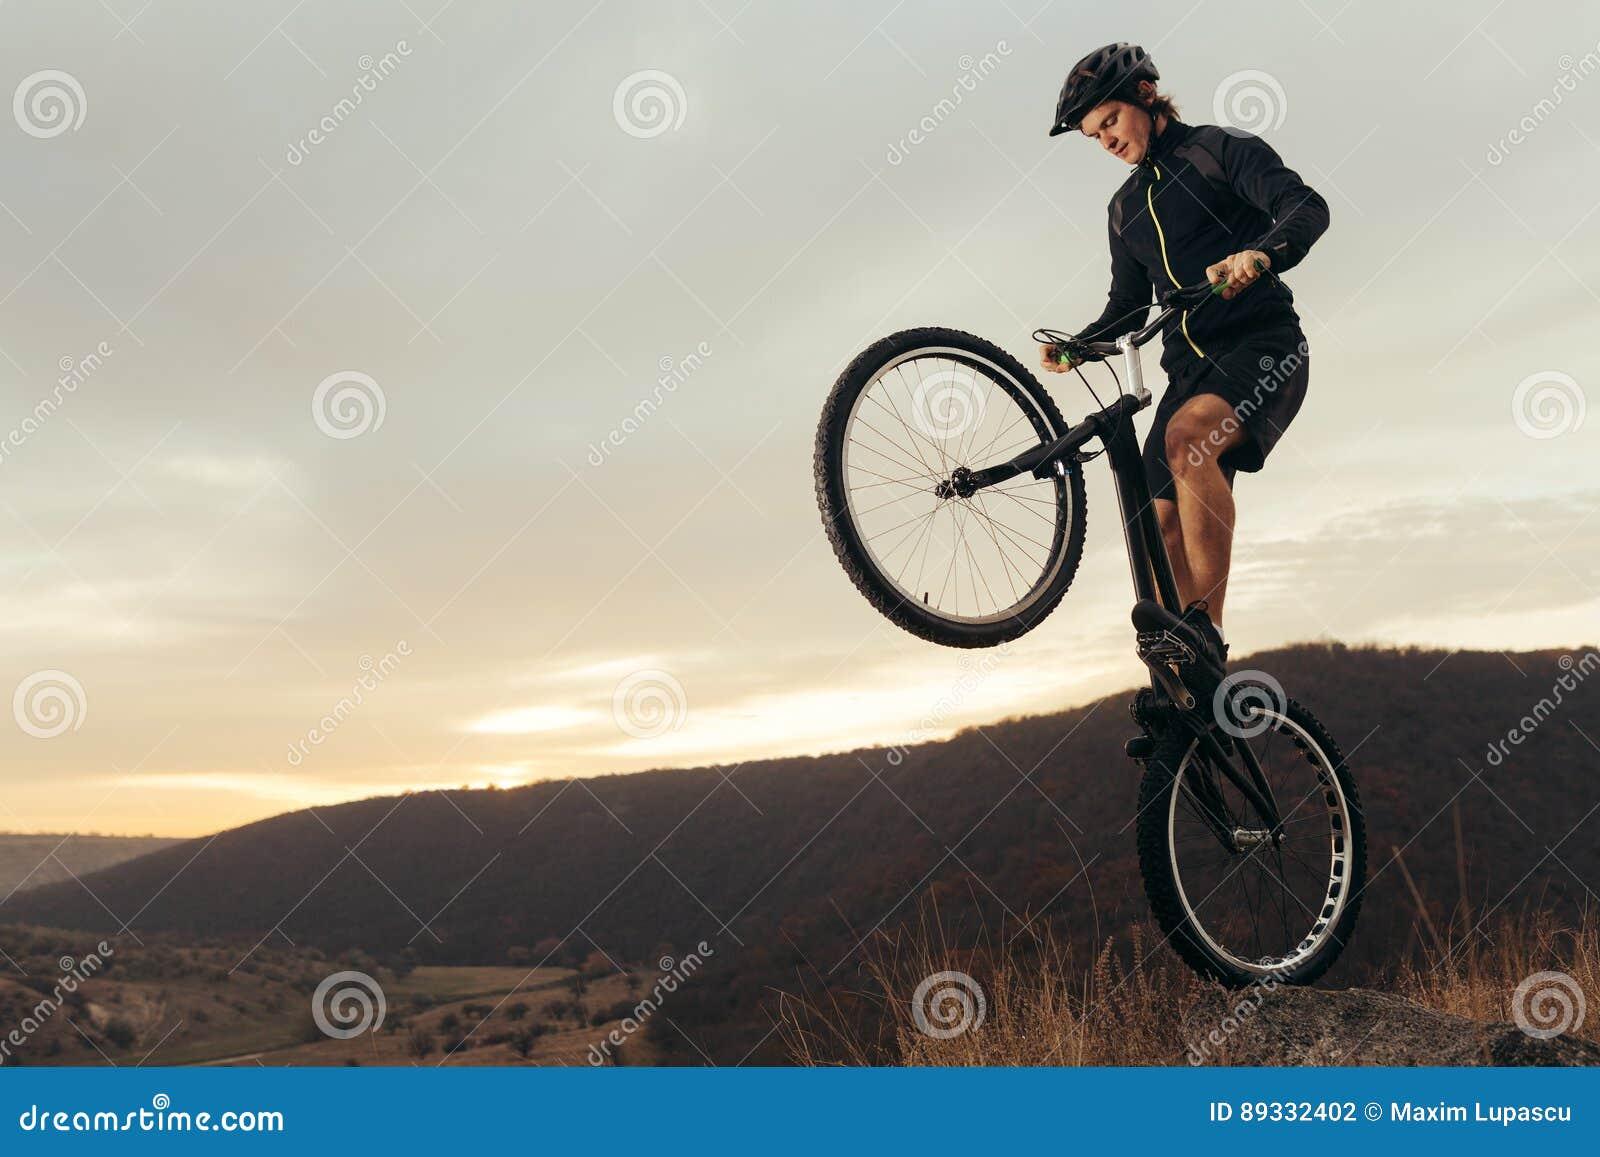 An Extreme Sportsman On Bike Stock Photo - Image of sport, biker